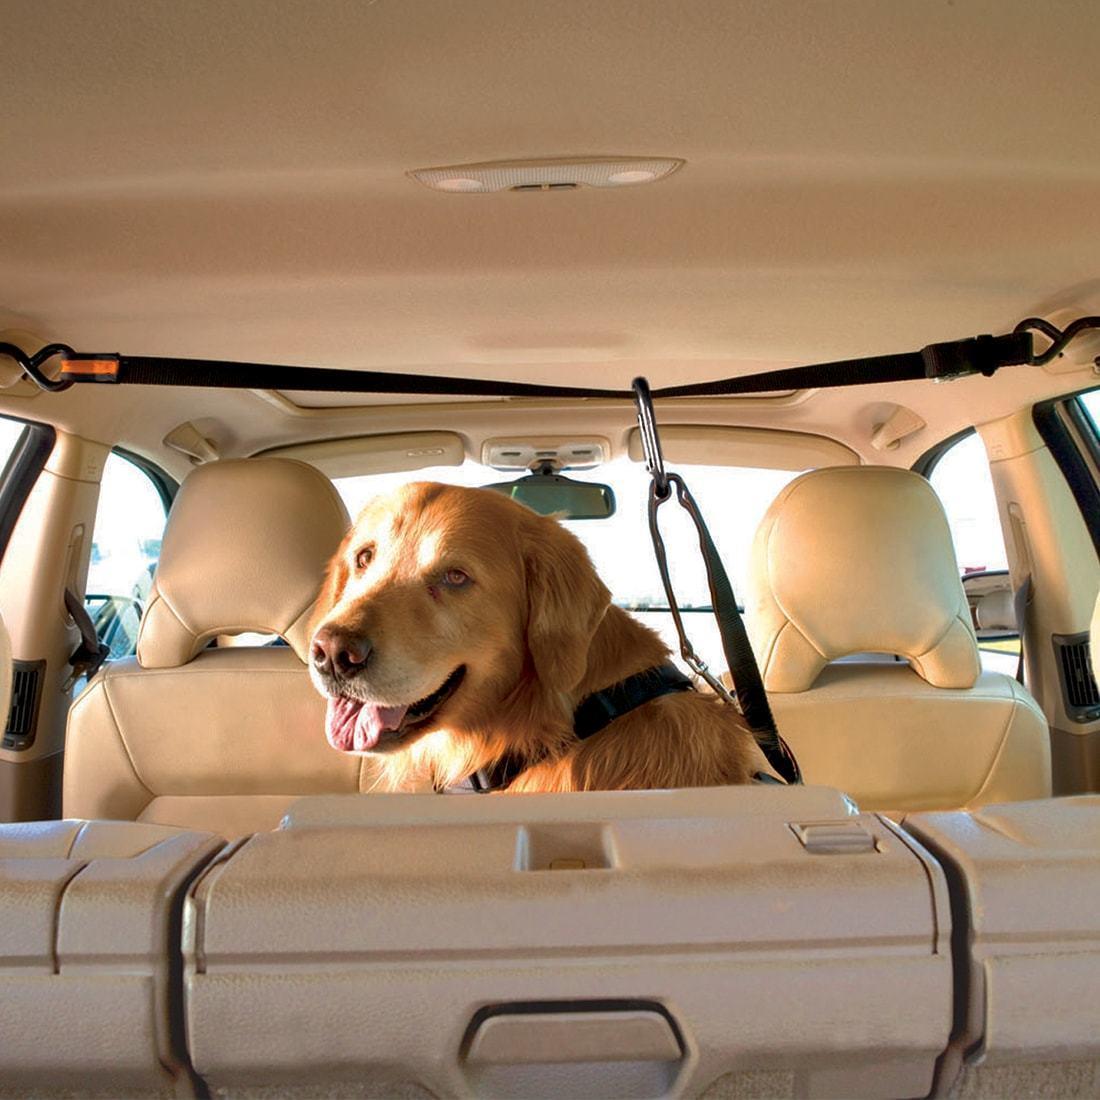 kg-dog-car-zip-line-restraint-5.jpg